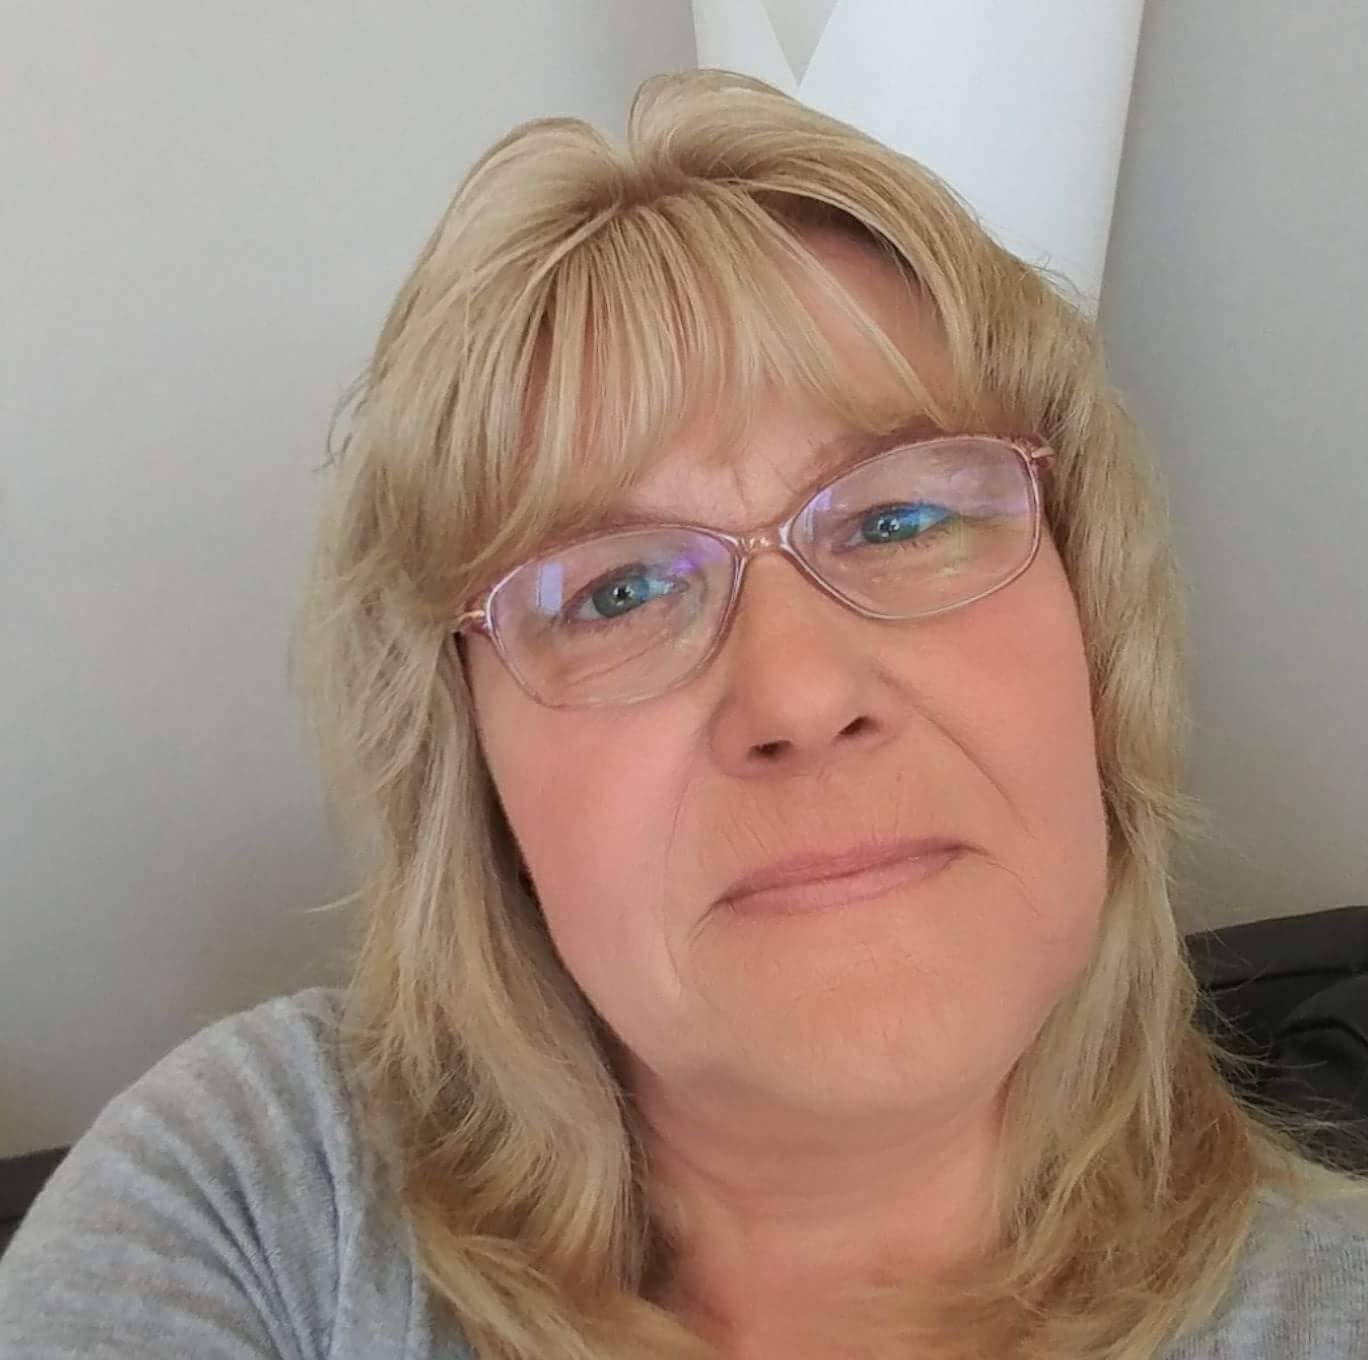 Yolanda uit nederland